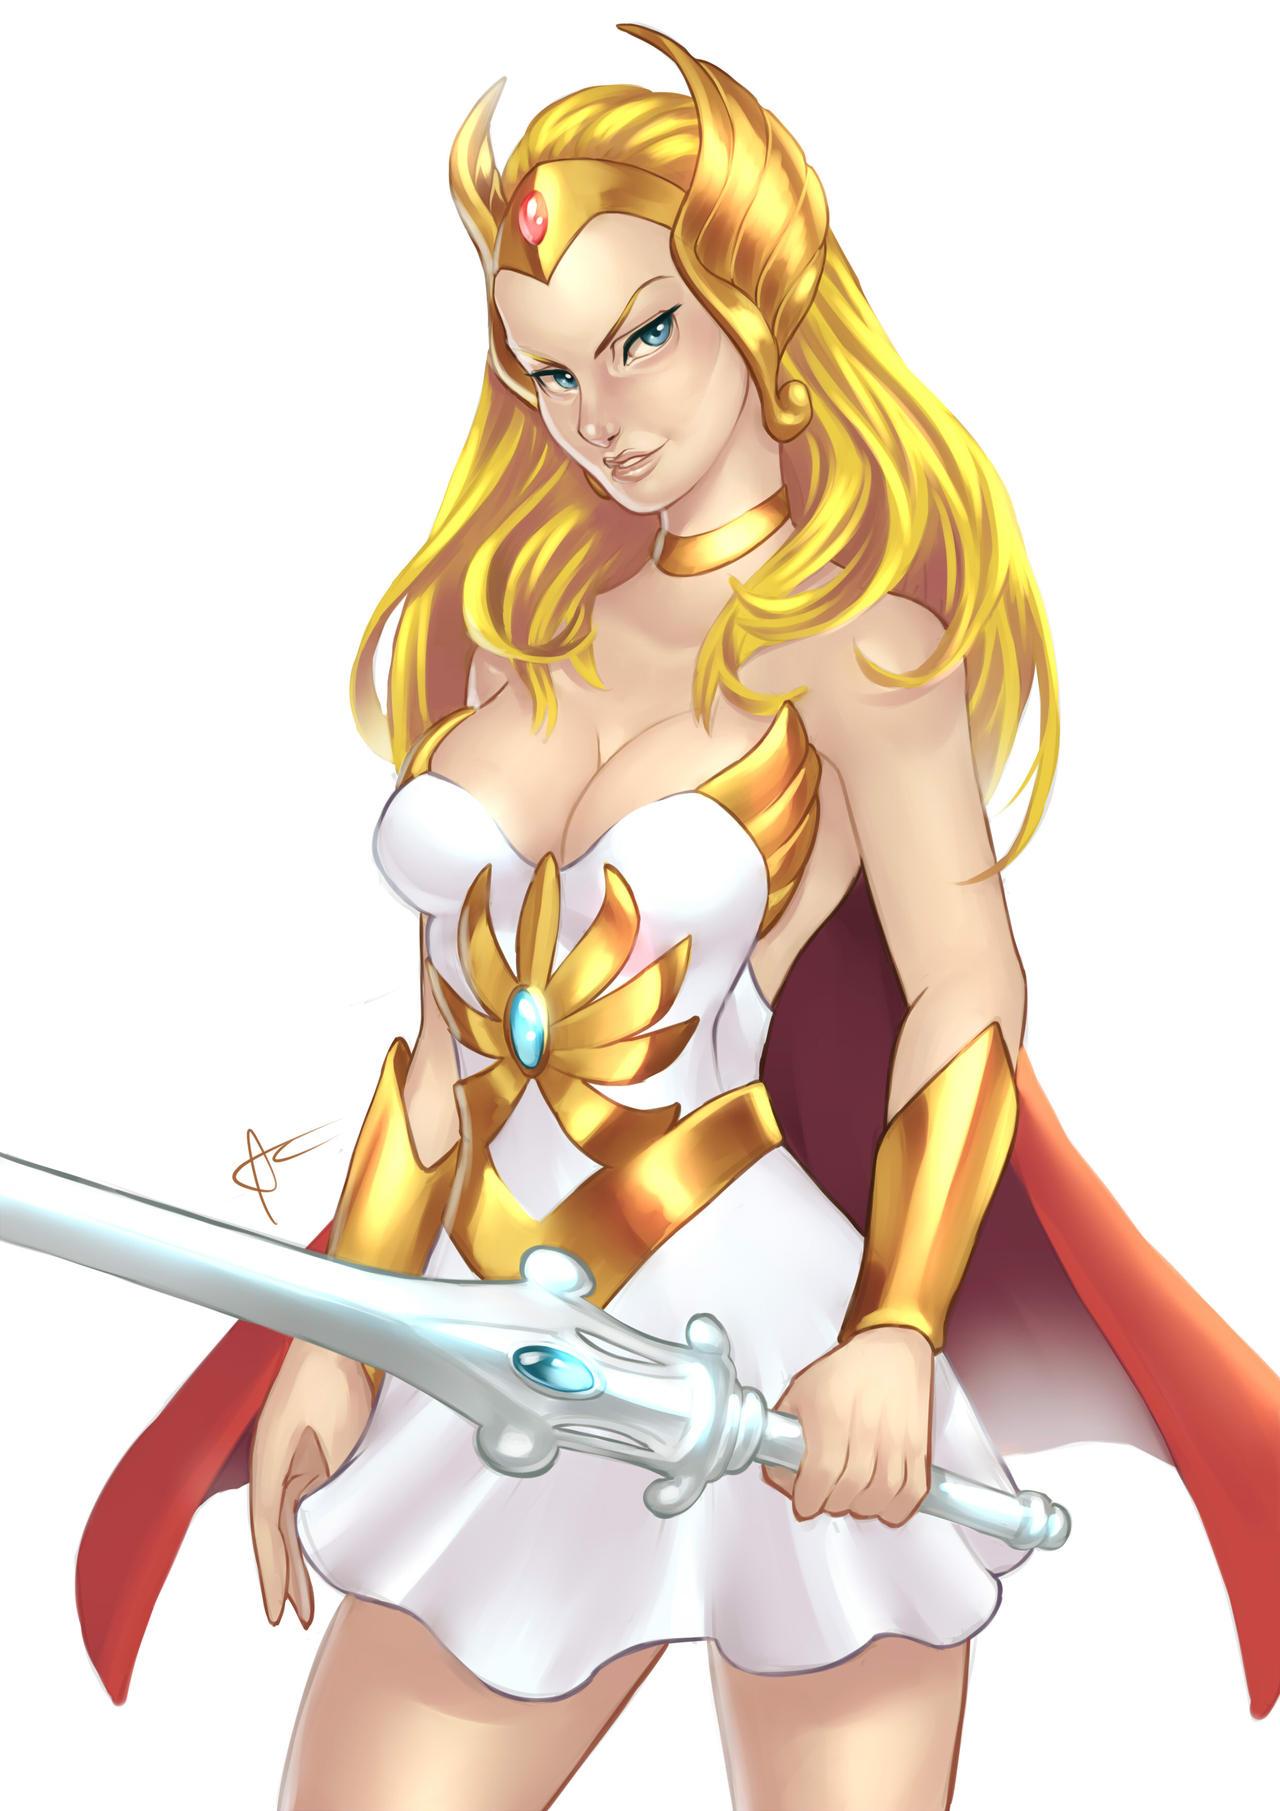 She-ra by https://www.deviantart.com/liss-ka on